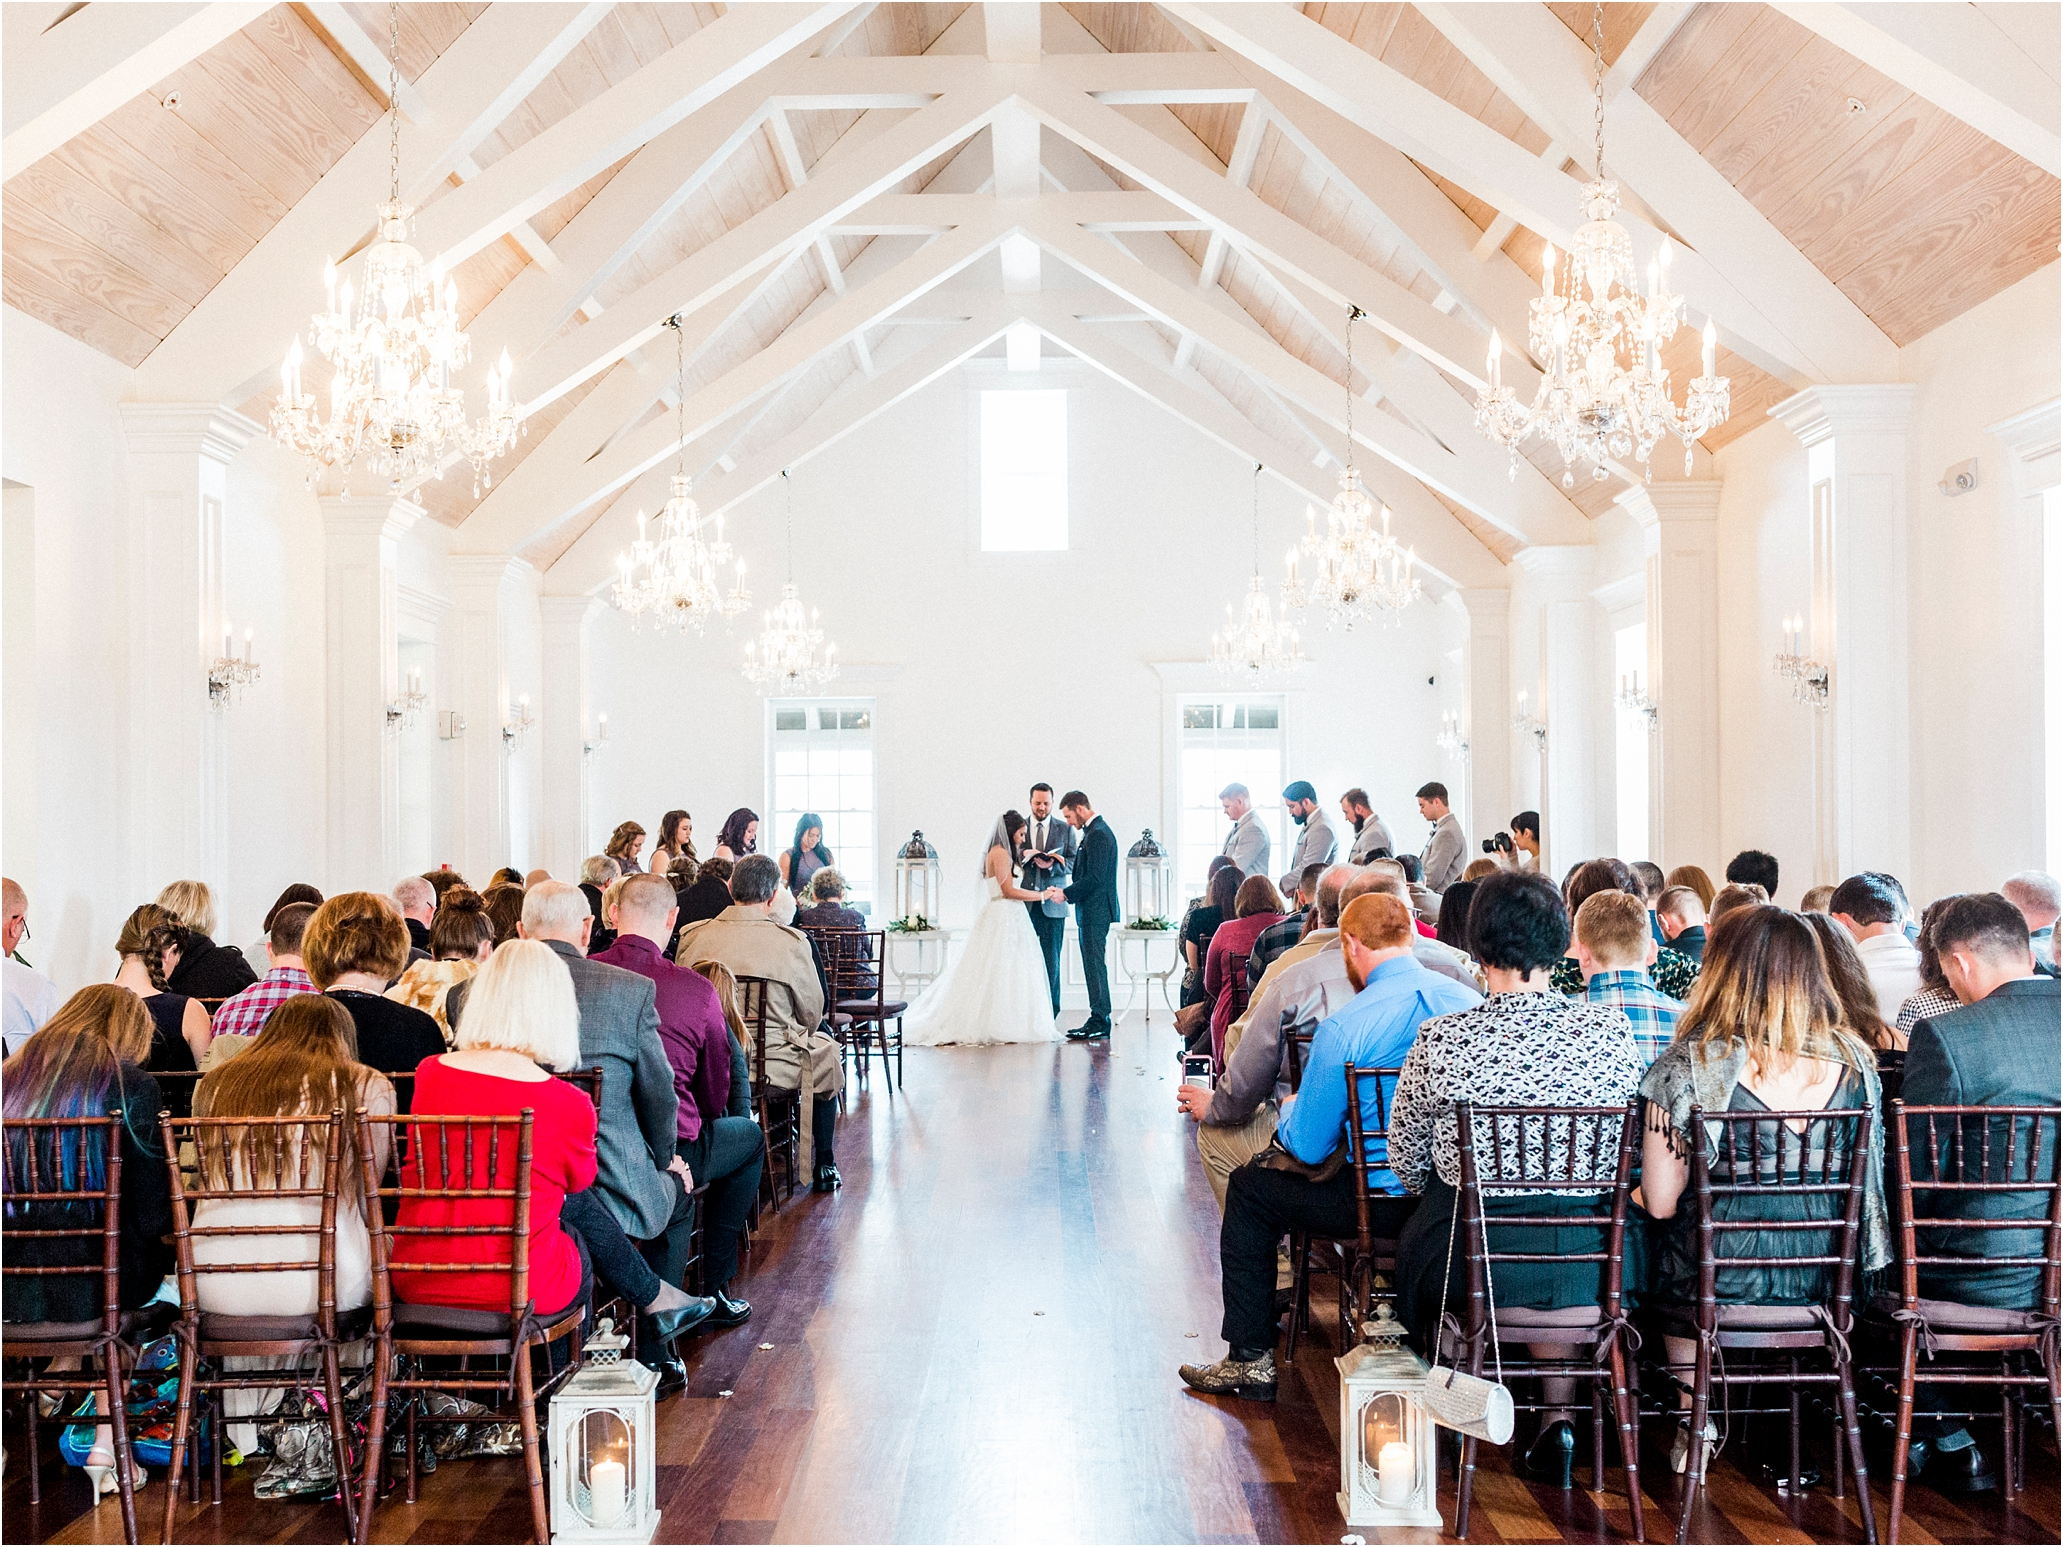 Lisa Silva Photography- Ponte Vedra Beach and Jacksonville, Florida Fine Art Film Wedding Photography- Wedding at The White Room Villa Blanca in St. Augustine, Florida_0048.jpg